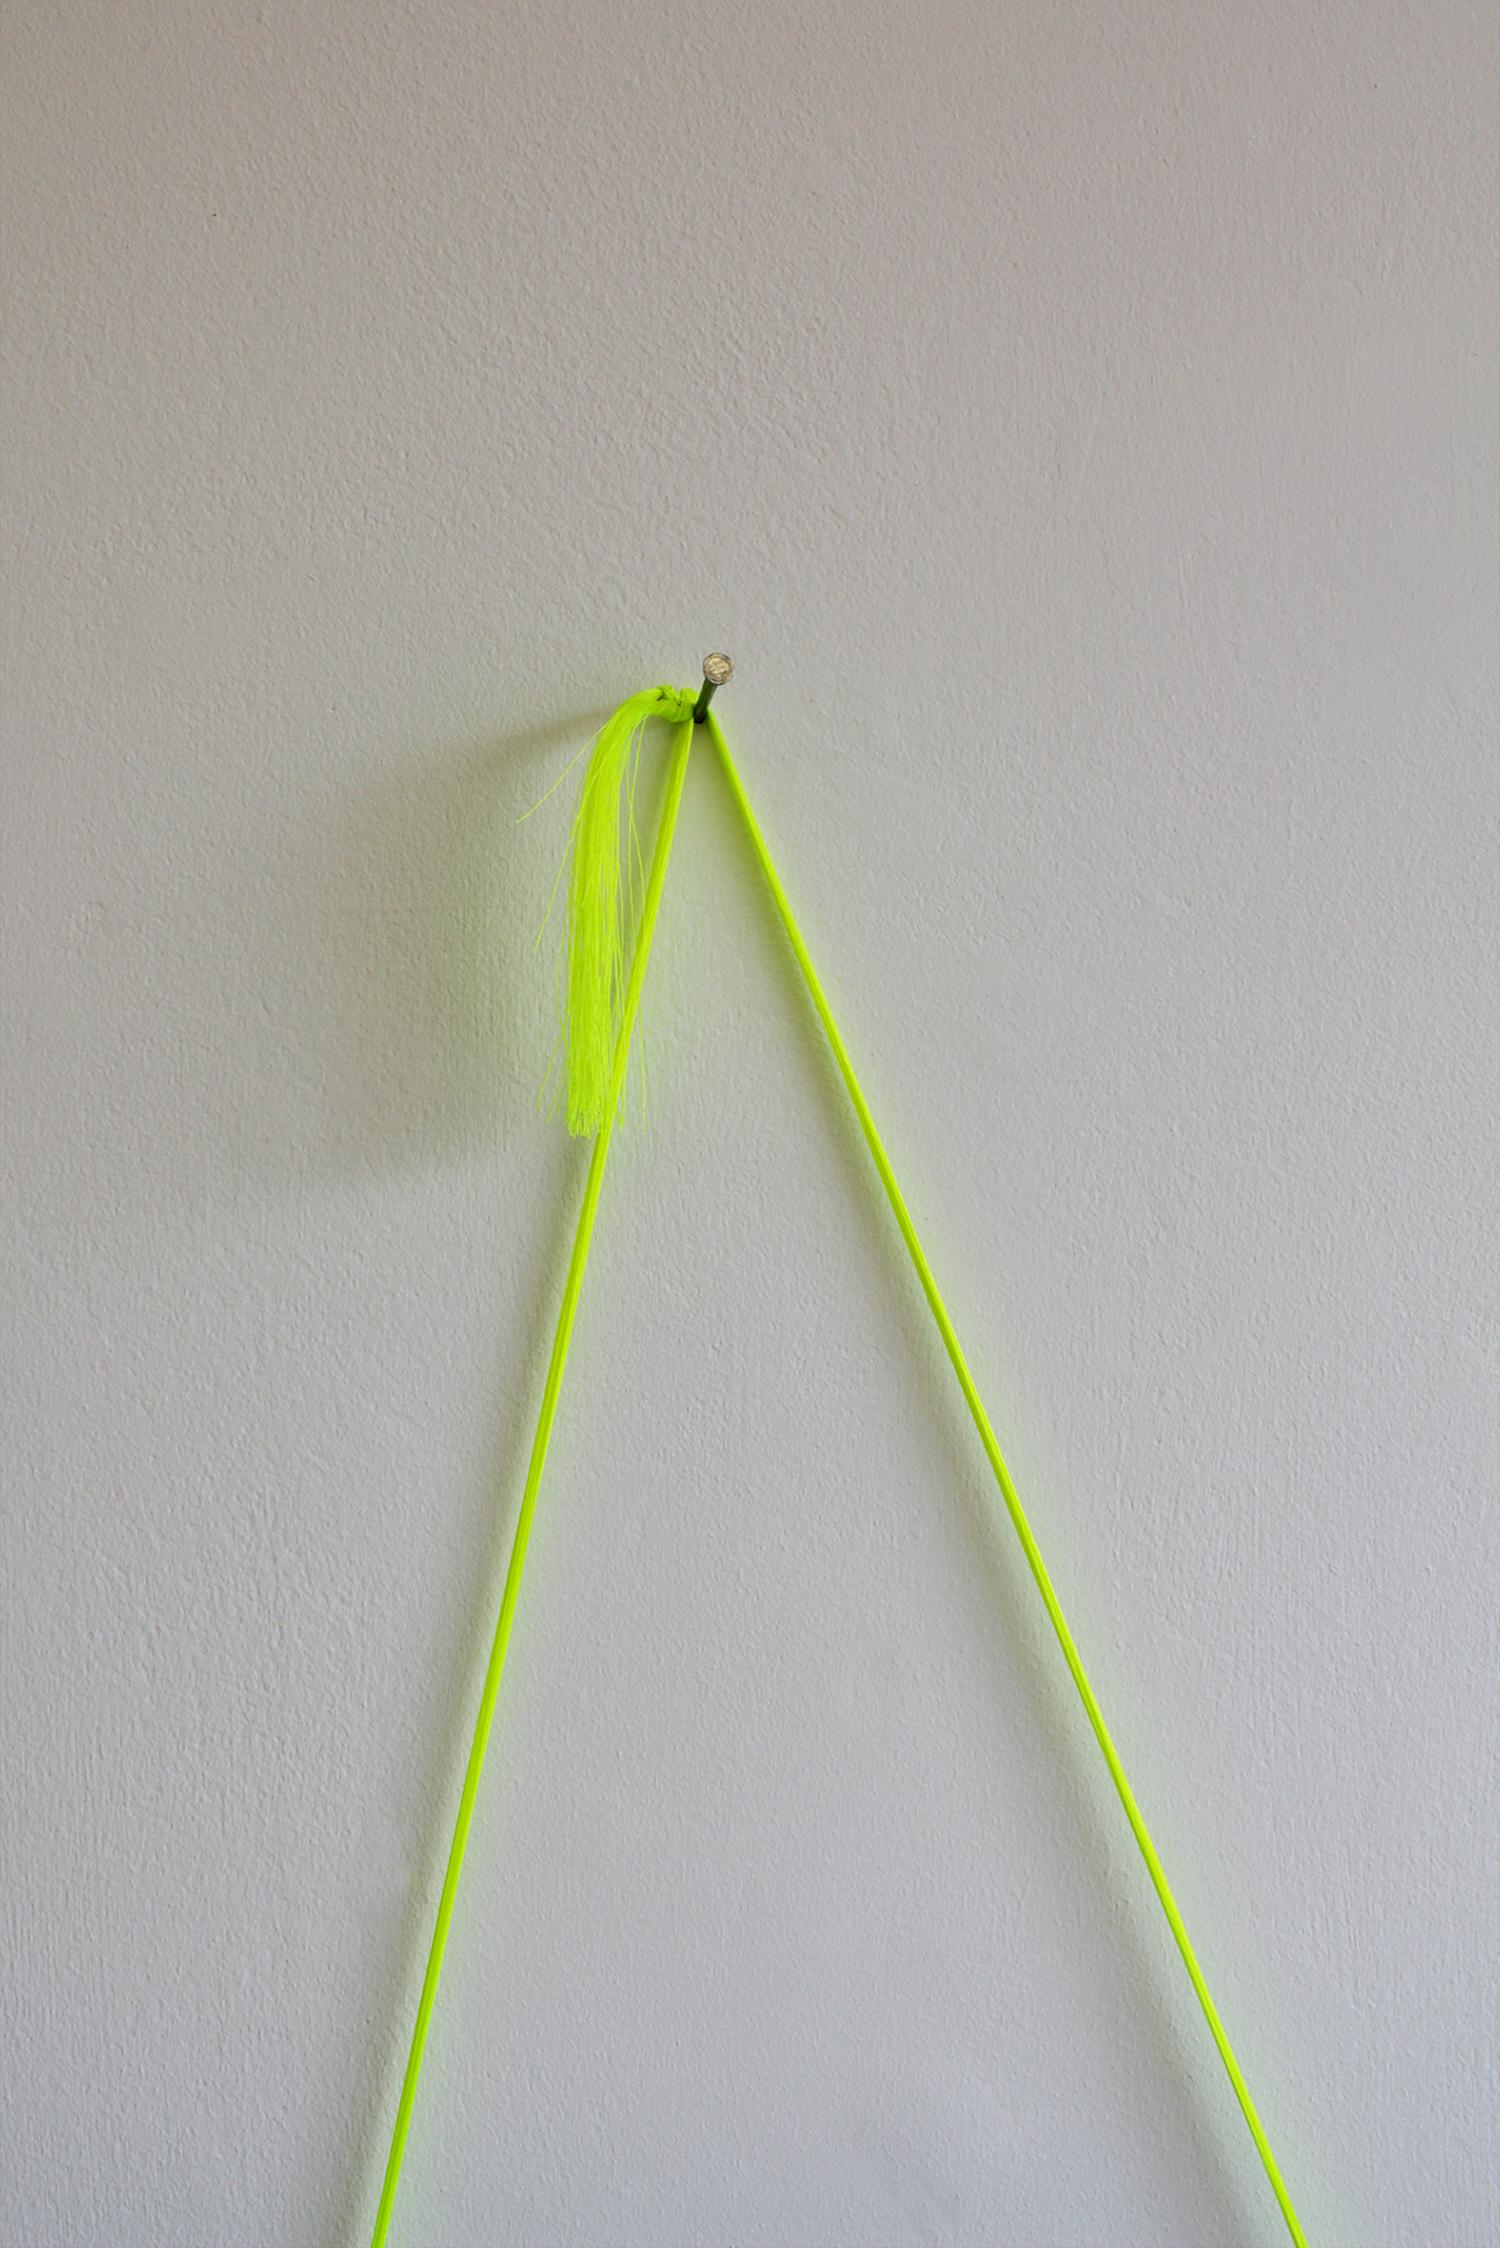 Kate_Terry_Fluorescent-Tube-Yellow_c.jpg